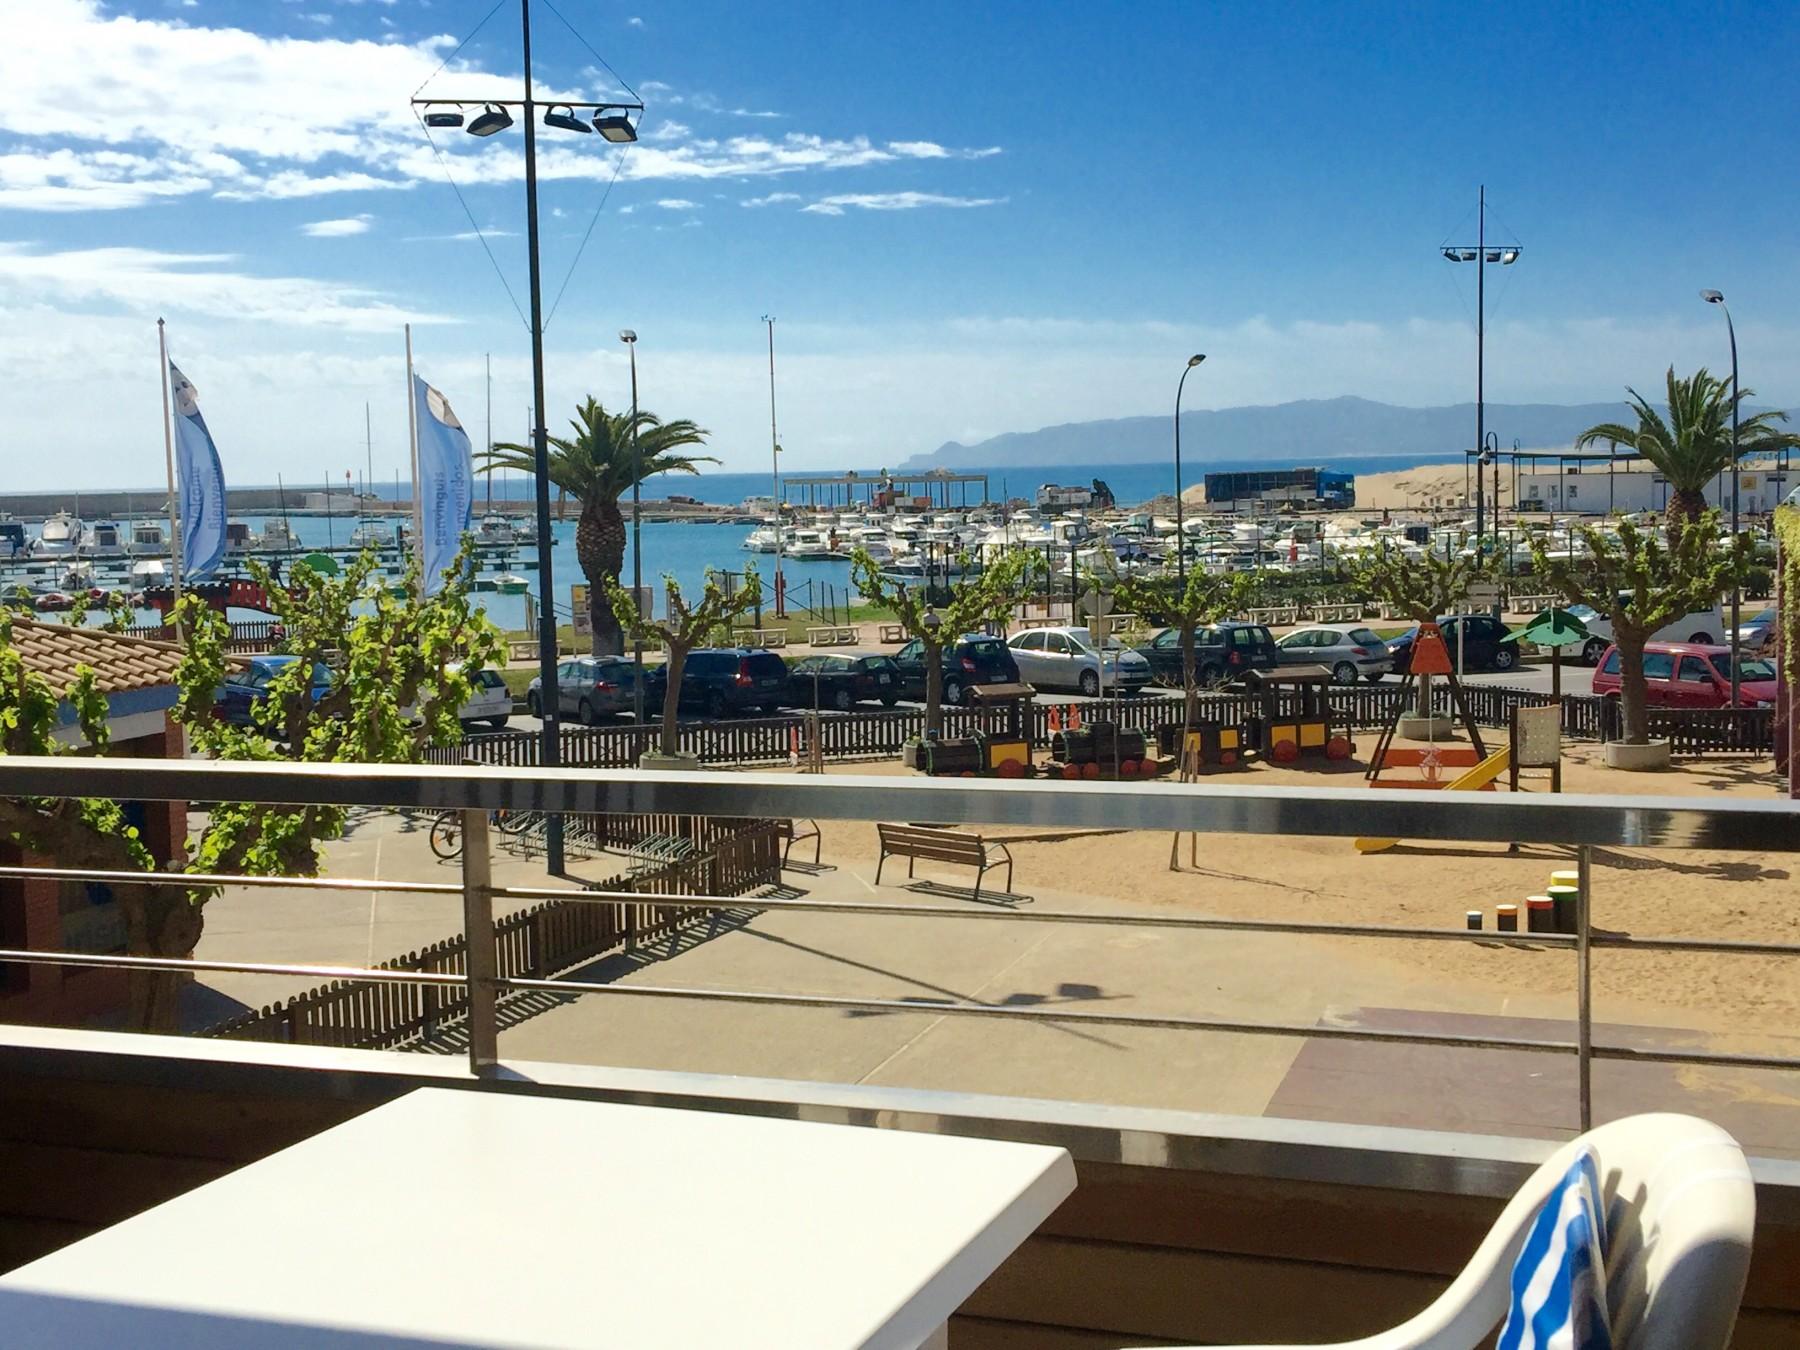 PLATJA 14 1-B for 6 guests in L Estartit, Spanien